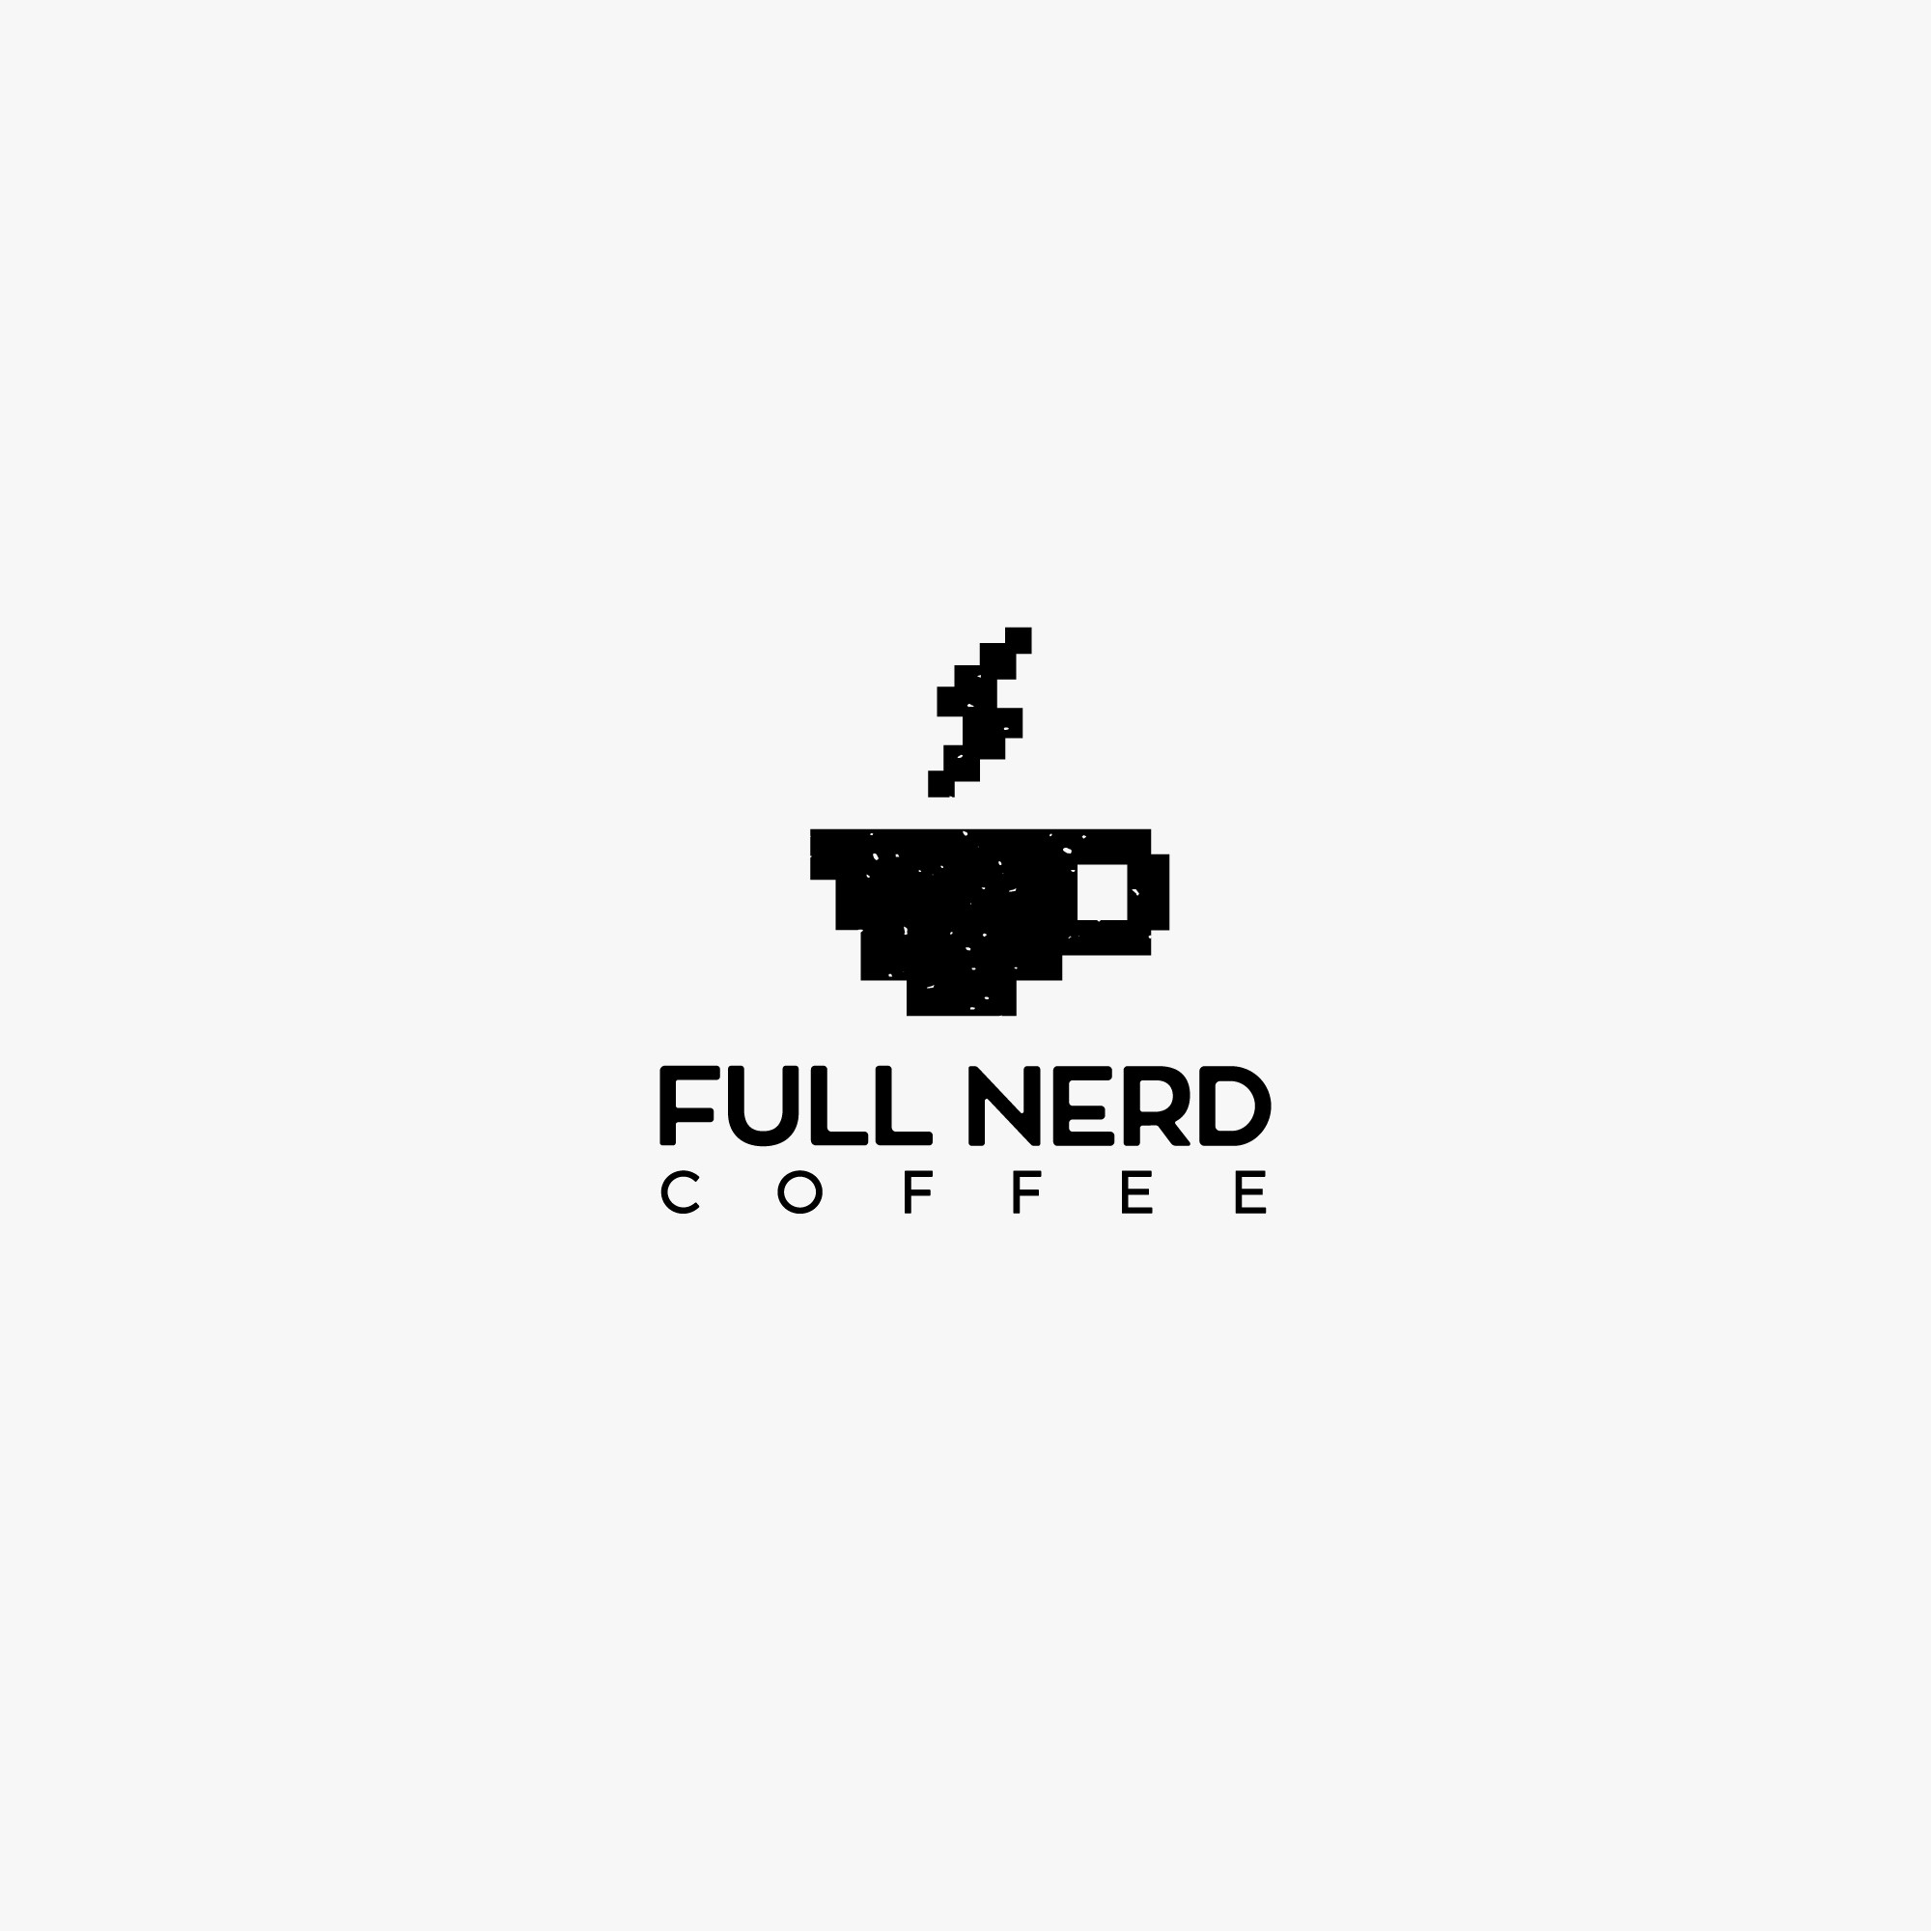 full nerd coffee 8-bit logo